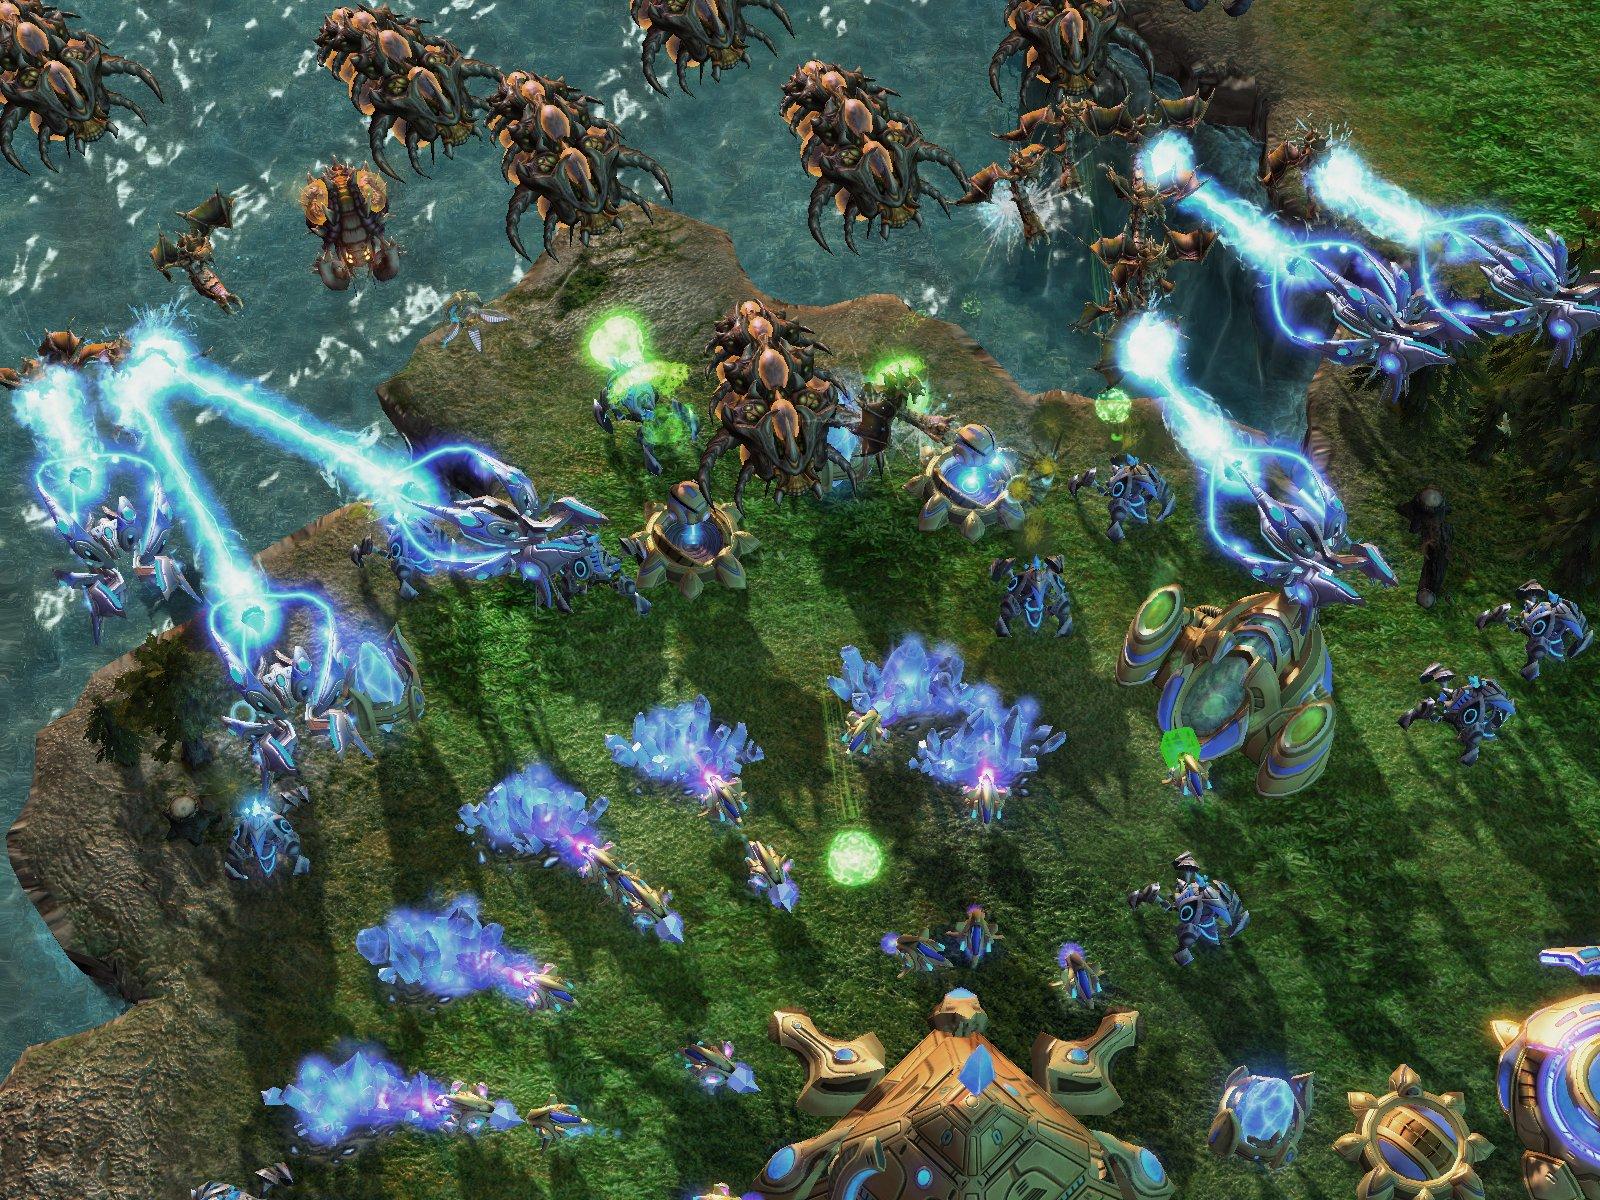 Wwi Starcraft 2 Round Up Starcraft 2 Gamereplays Org